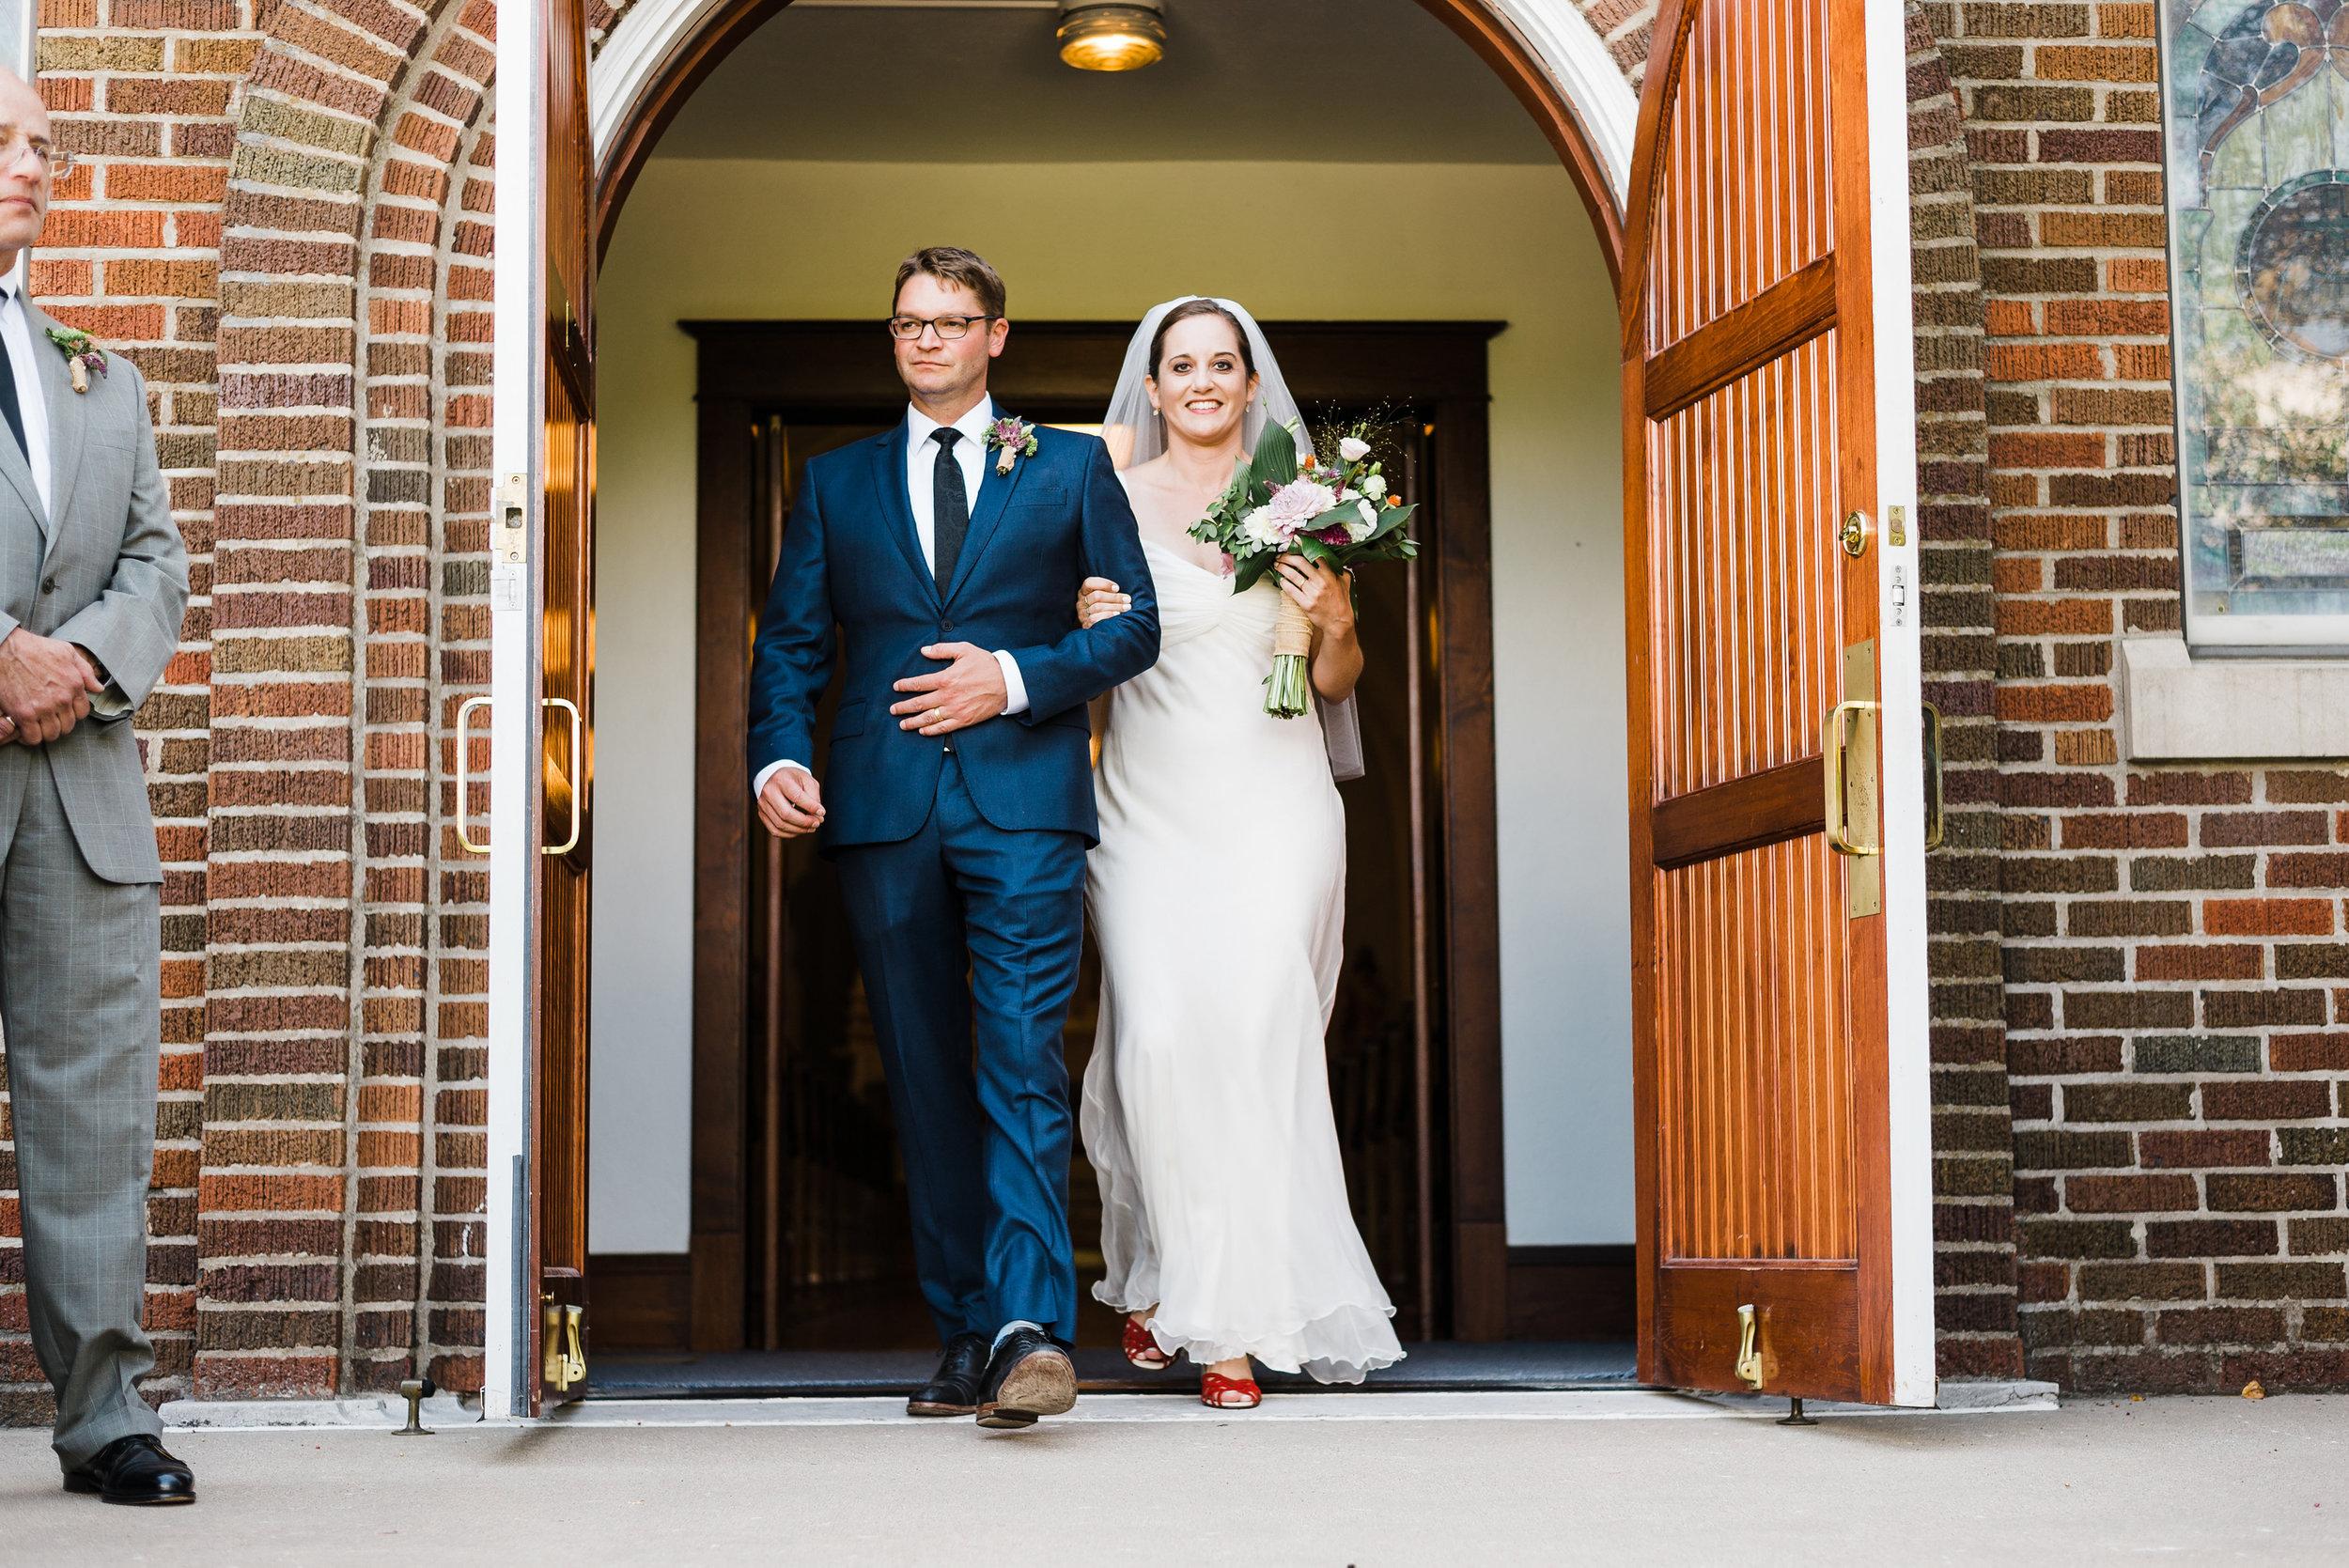 Saints Peter and Paul Church - Sutliff, Iowa, Wedding Photographer